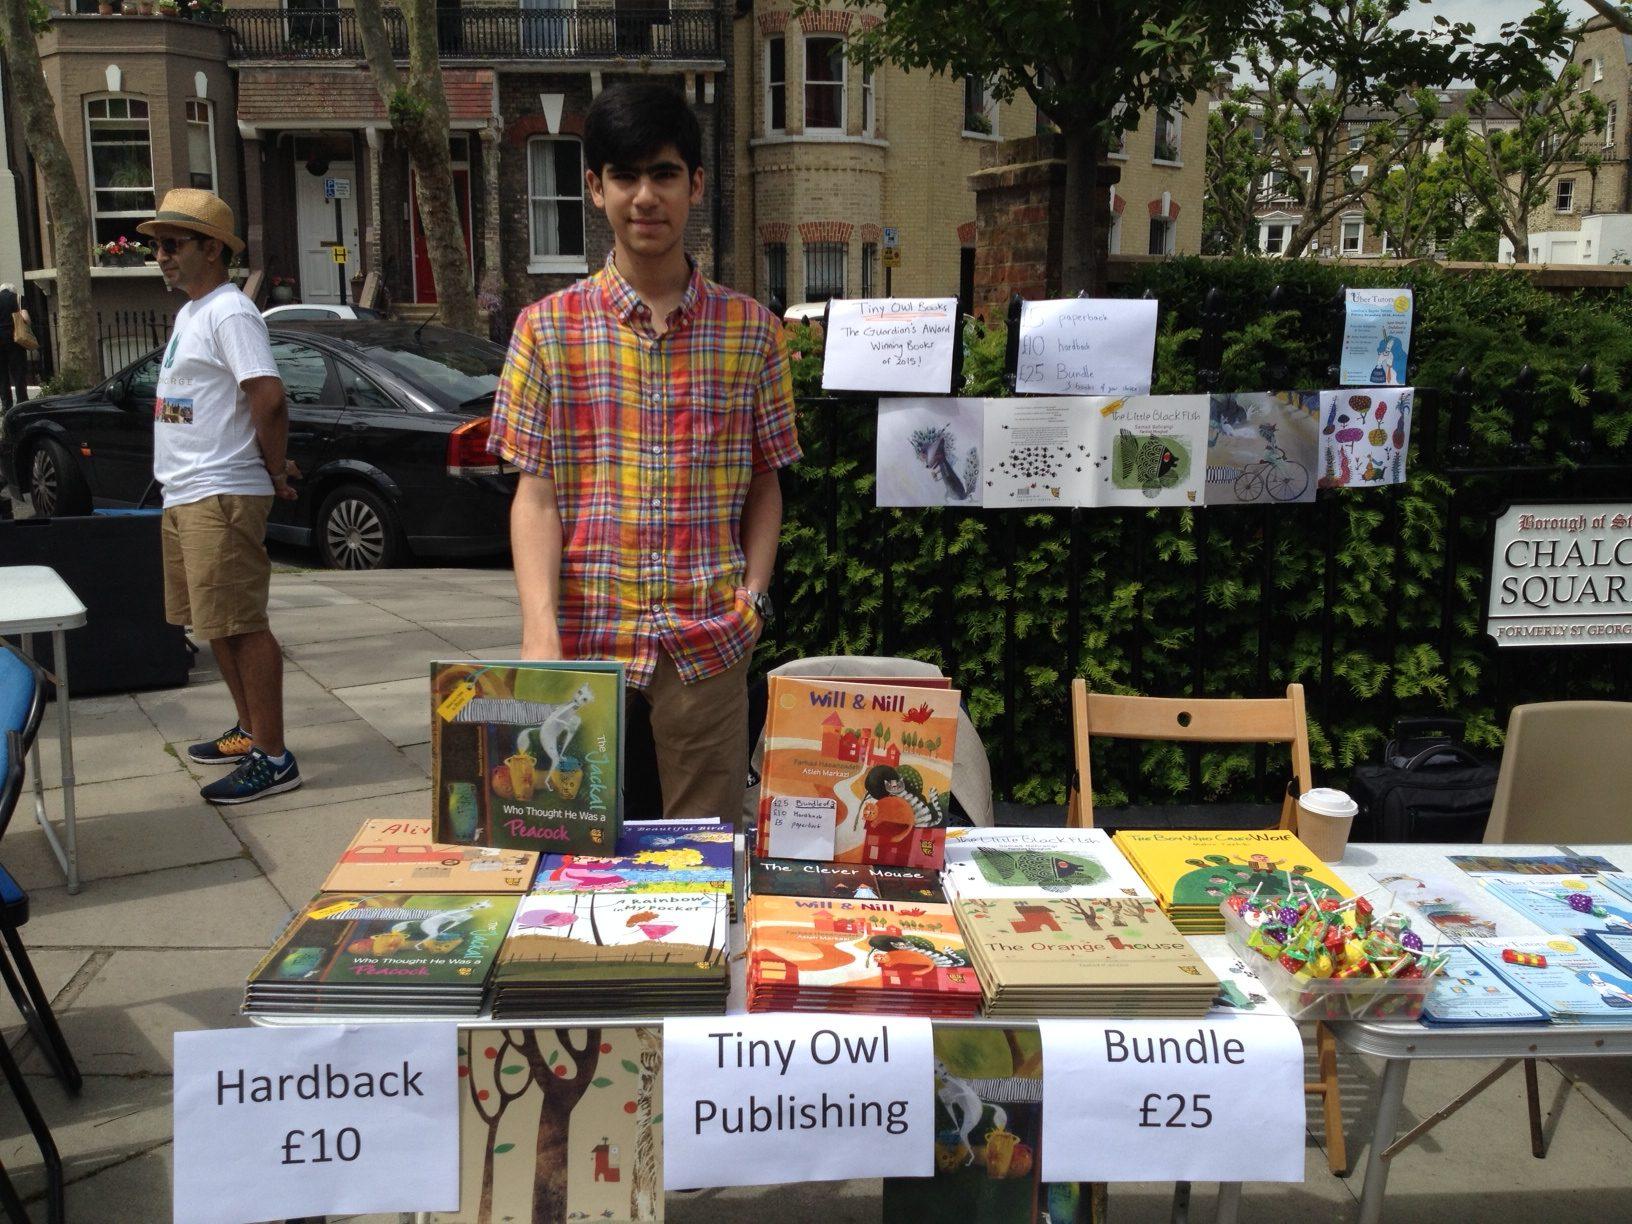 Tiny Owl Publishing at Primrose Hill Summer Fair 2016